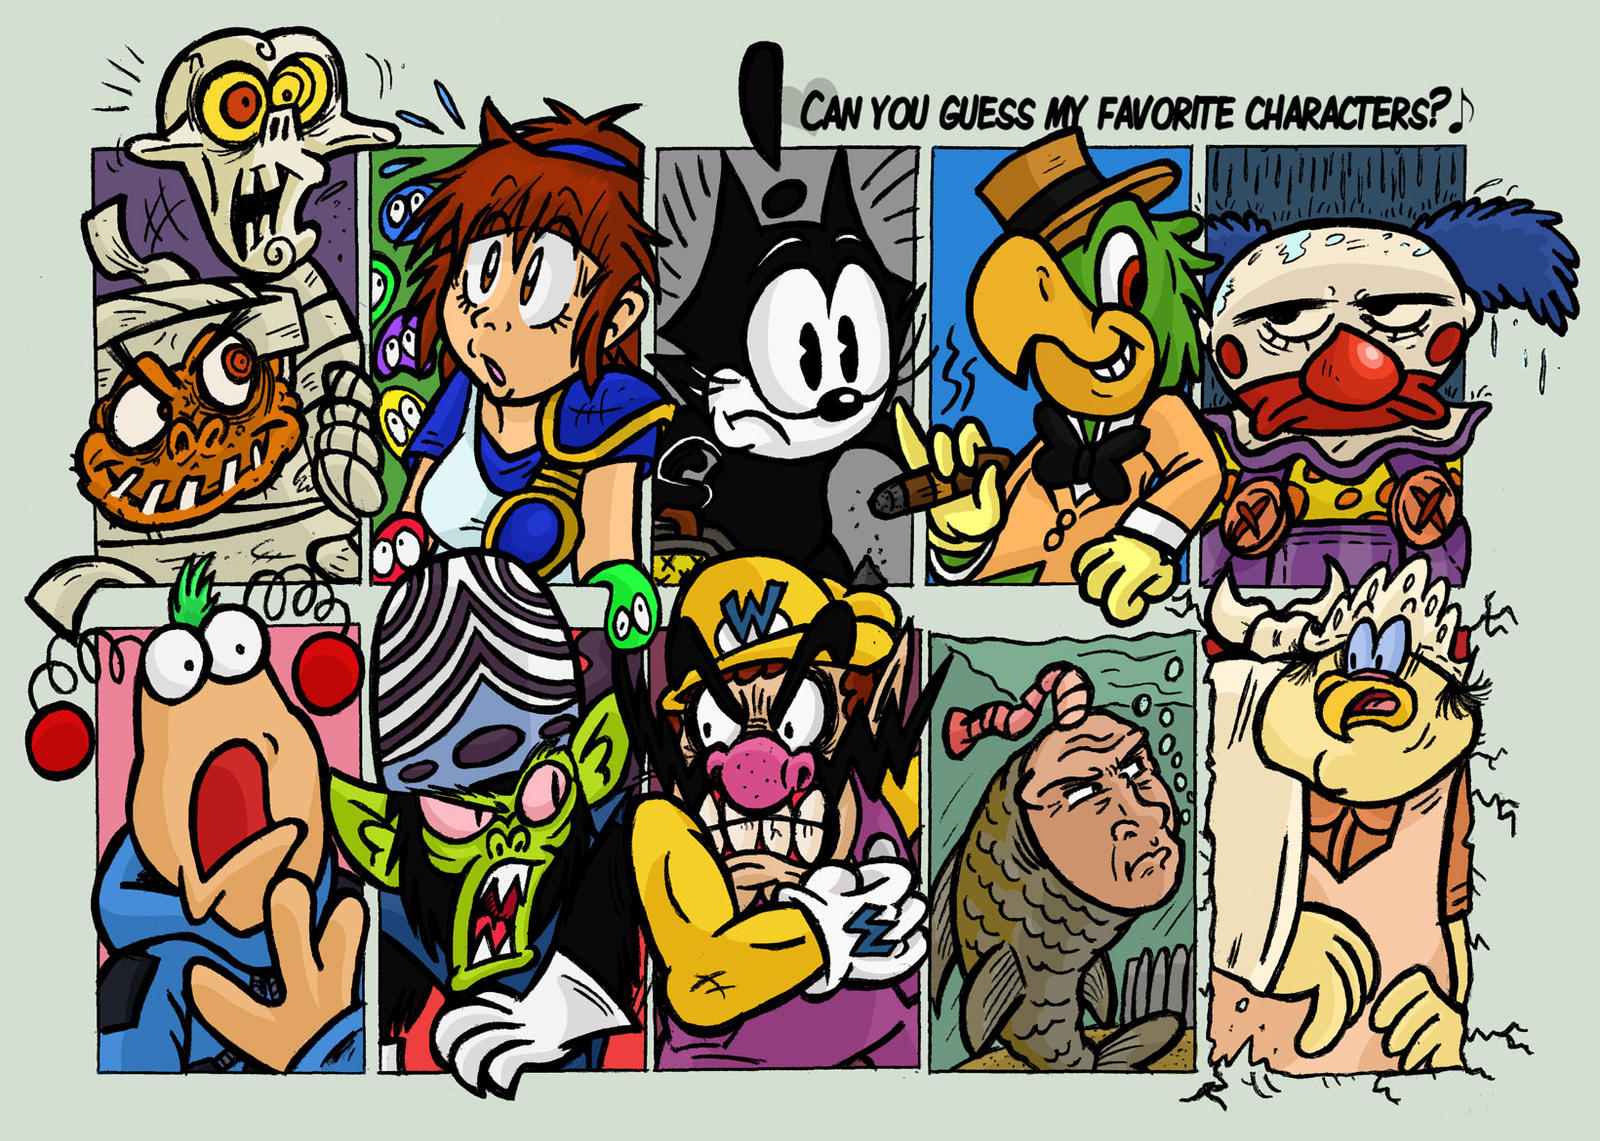 Favorite Characters Meme by GagaMan